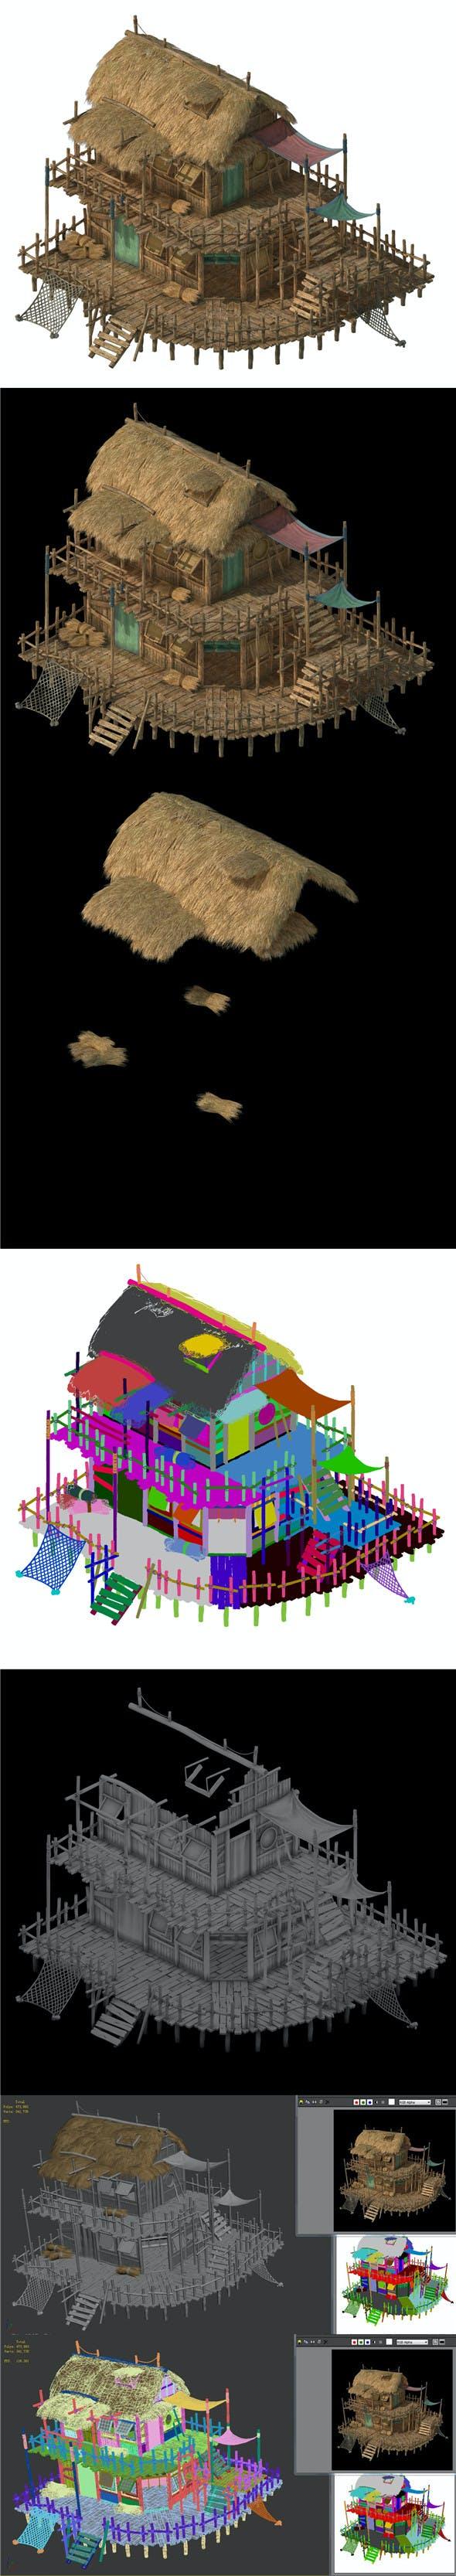 Seaside building - fisherman thatched cottage 01 - 3DOcean Item for Sale